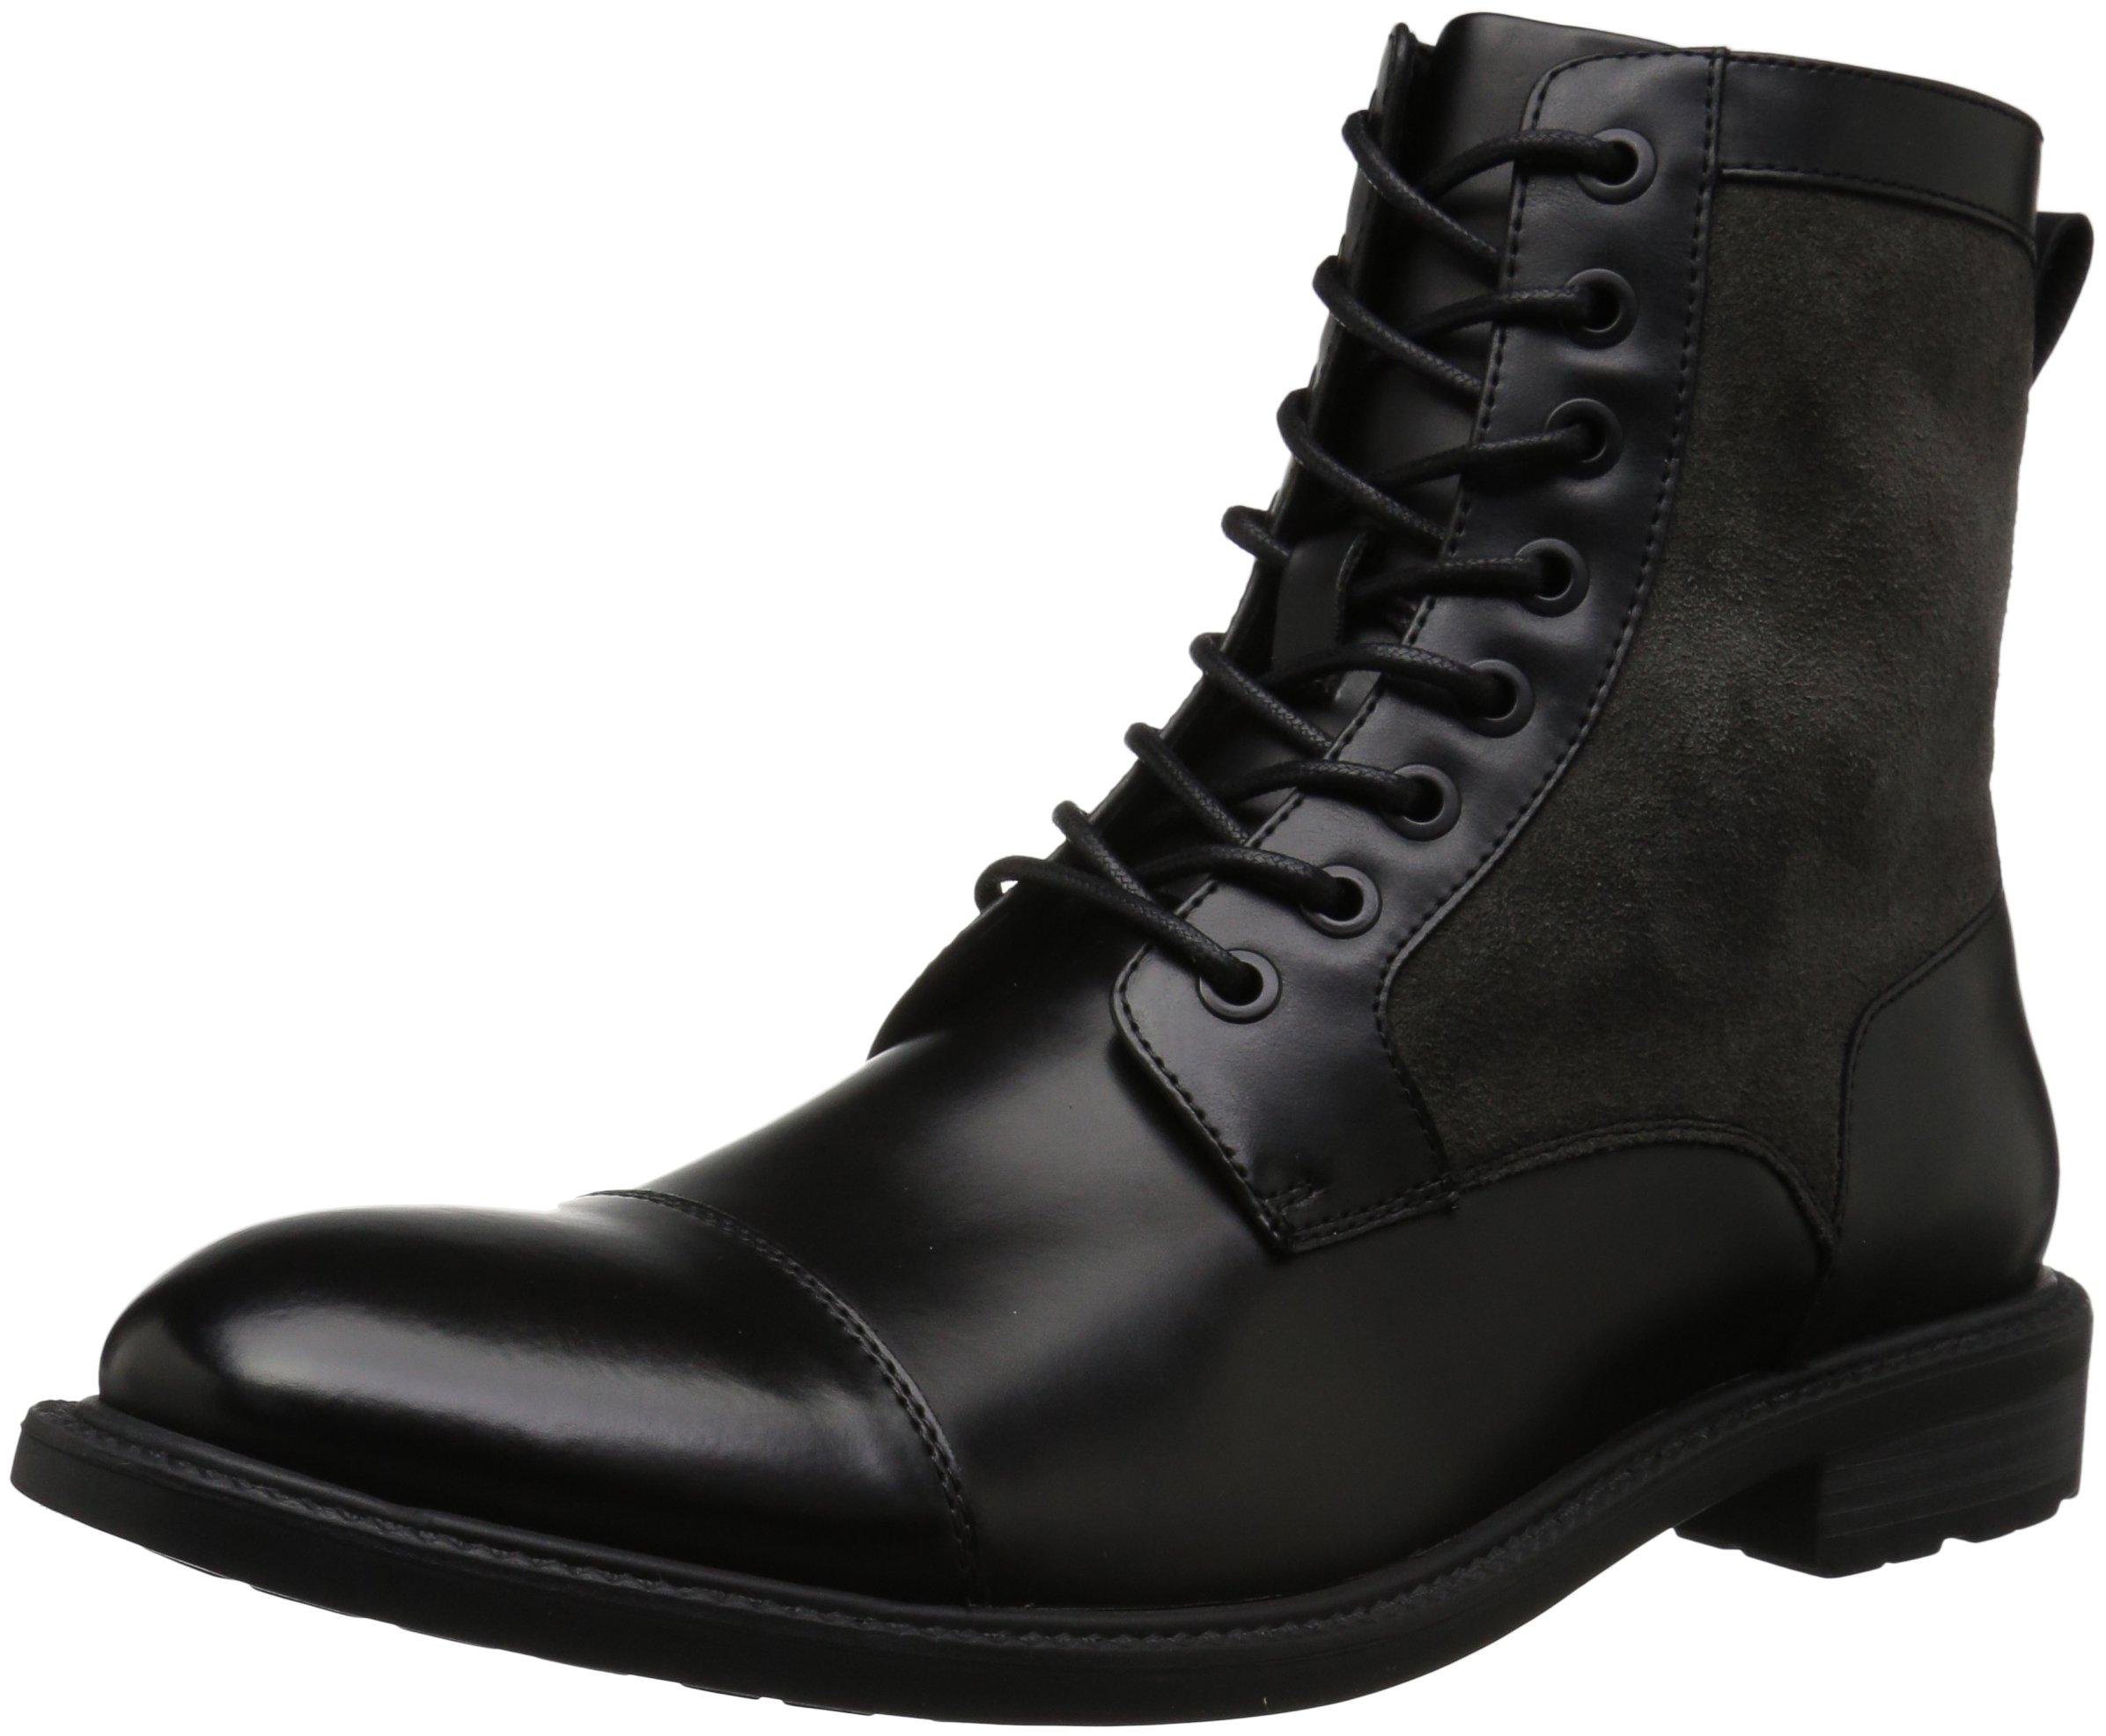 Kenneth Cole REACTION Men's Design 20655 Combat Boot, Black/Grey, 11 M US